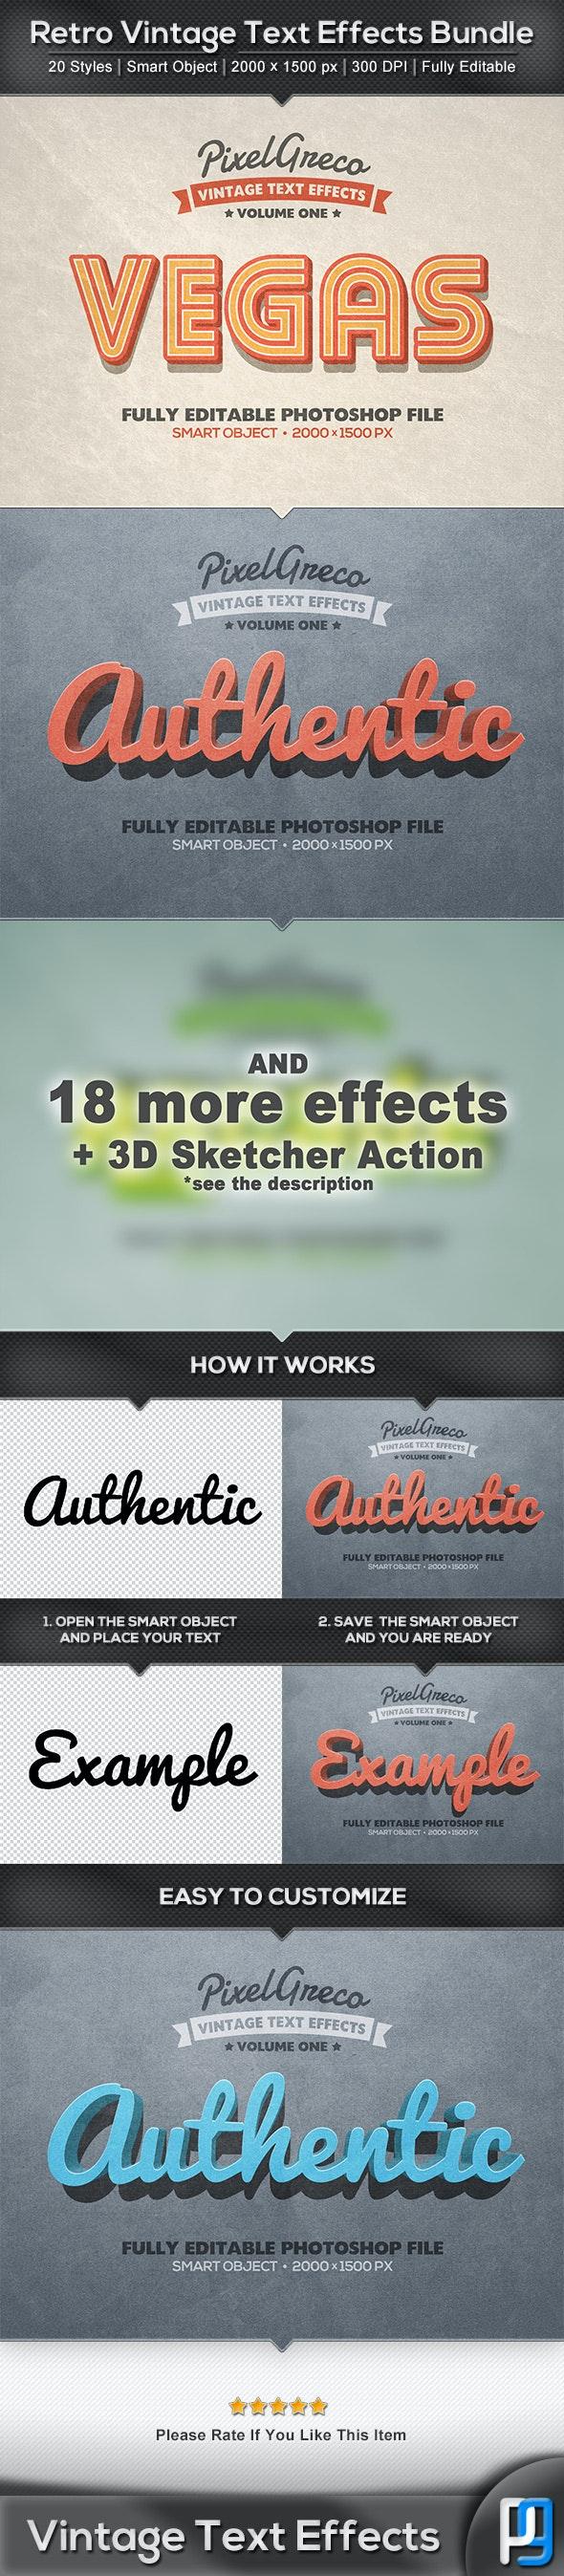 20 Retro Vintage Text Effects Bundle + Photoshop Action - Text Effects Actions